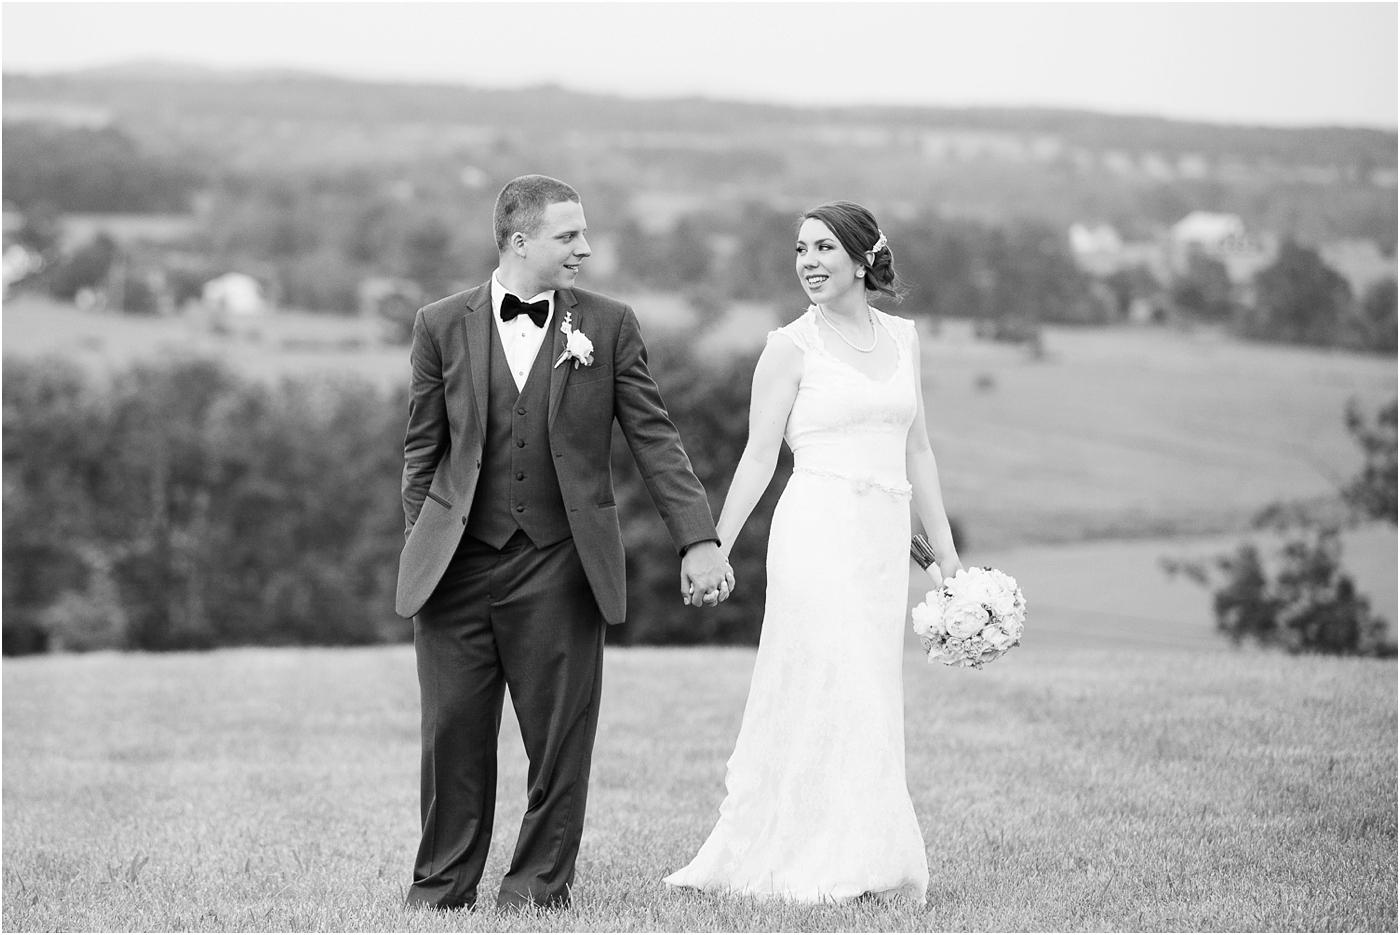 Gettysburg-lodges-wedding-photos-105.jpg